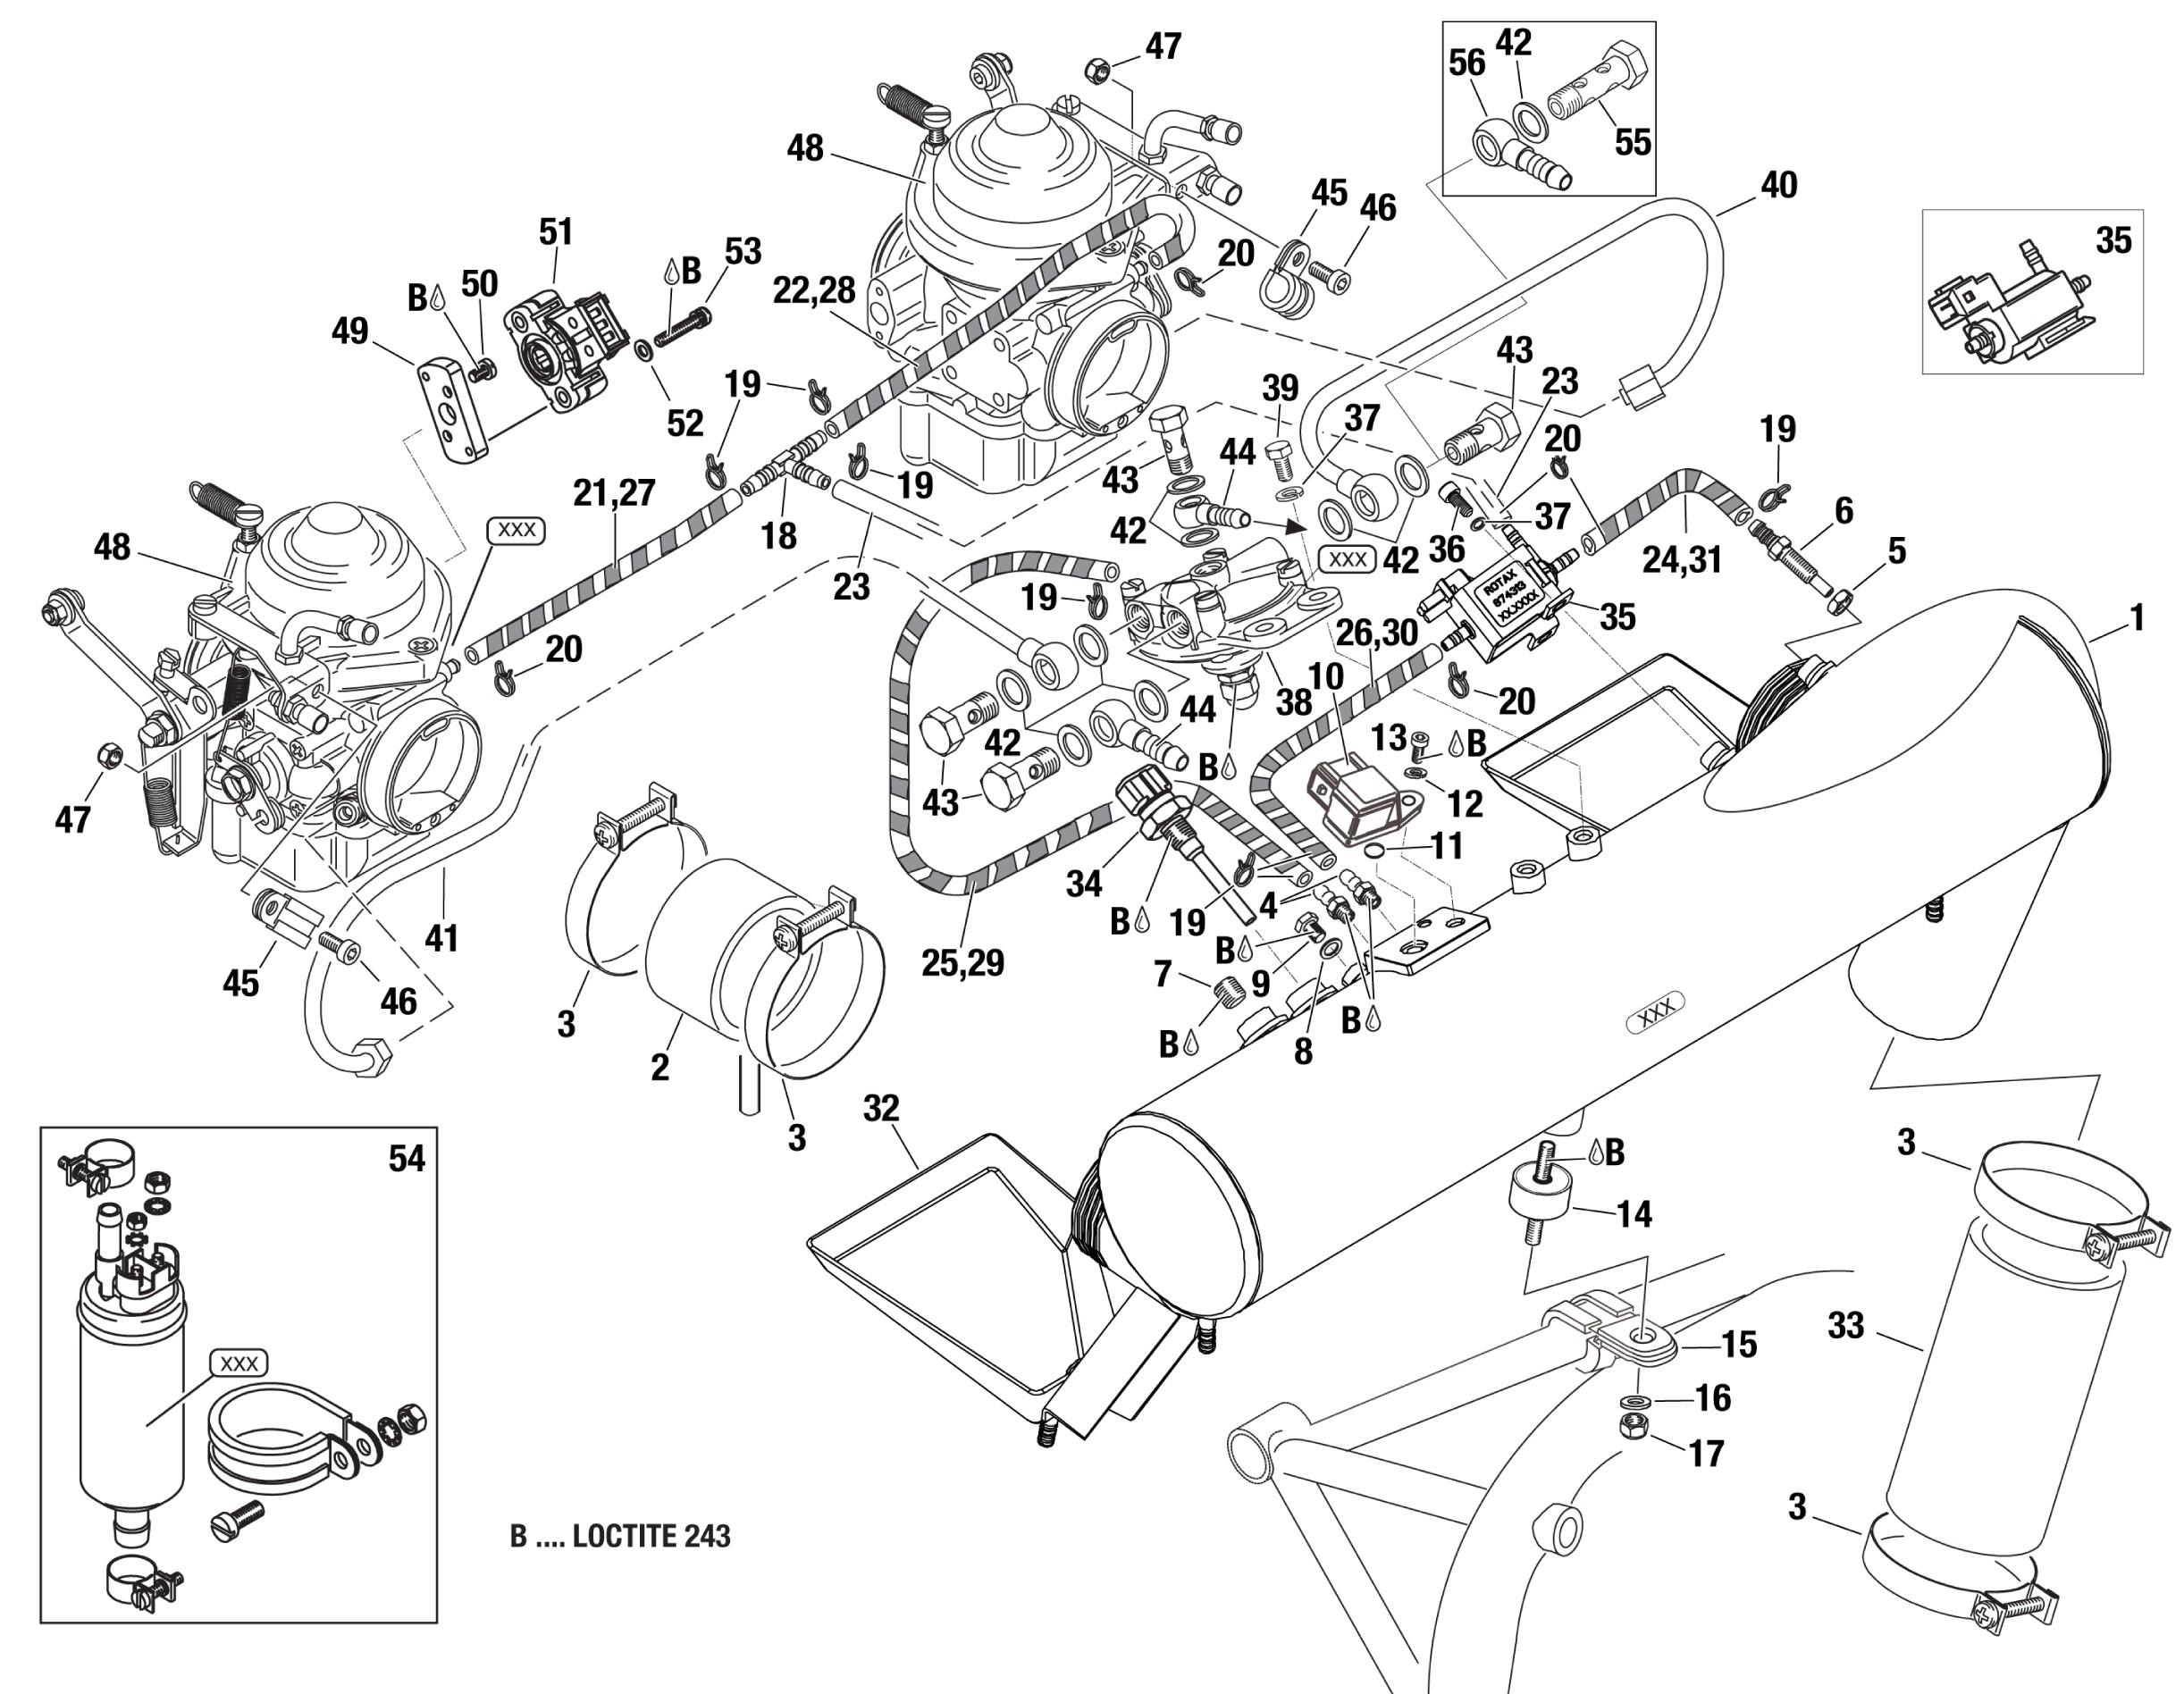 914 Airbox Assy 3 Way Solenoid Valve Assy Fuel Pressure Regulator